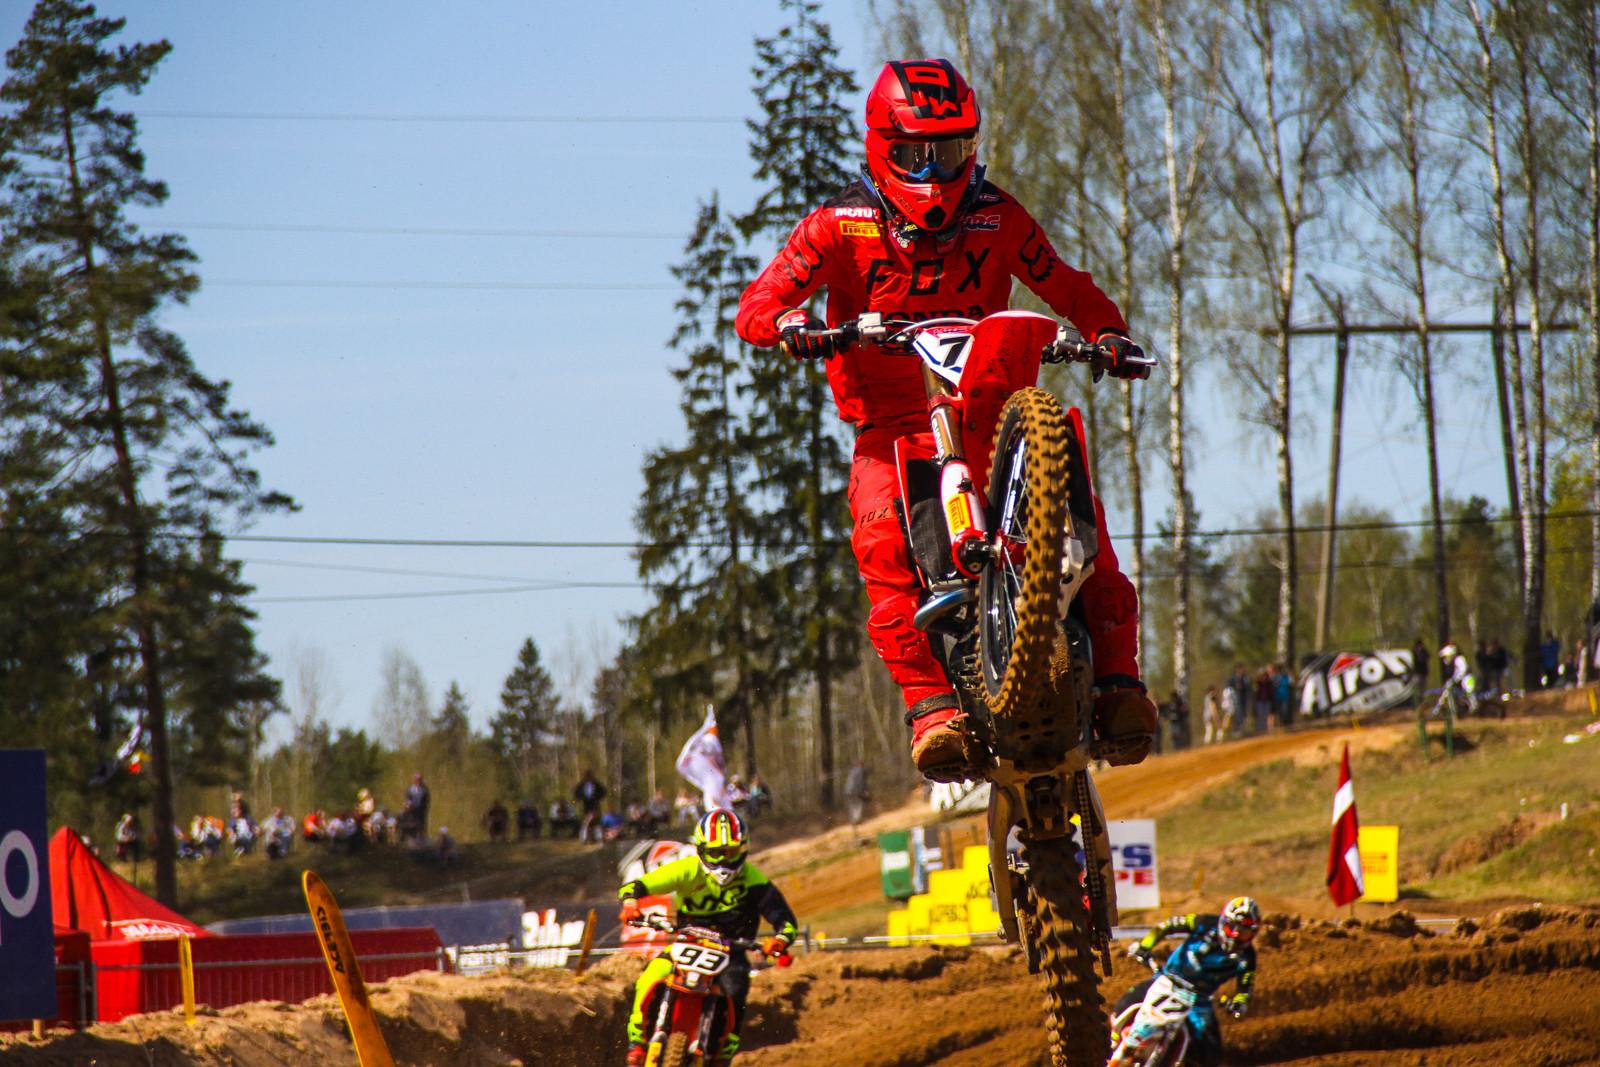 Evgeny Bobryshev - Photo Blast: 2017 MXGP of Latvia - Motocross Pictures - Vital MX